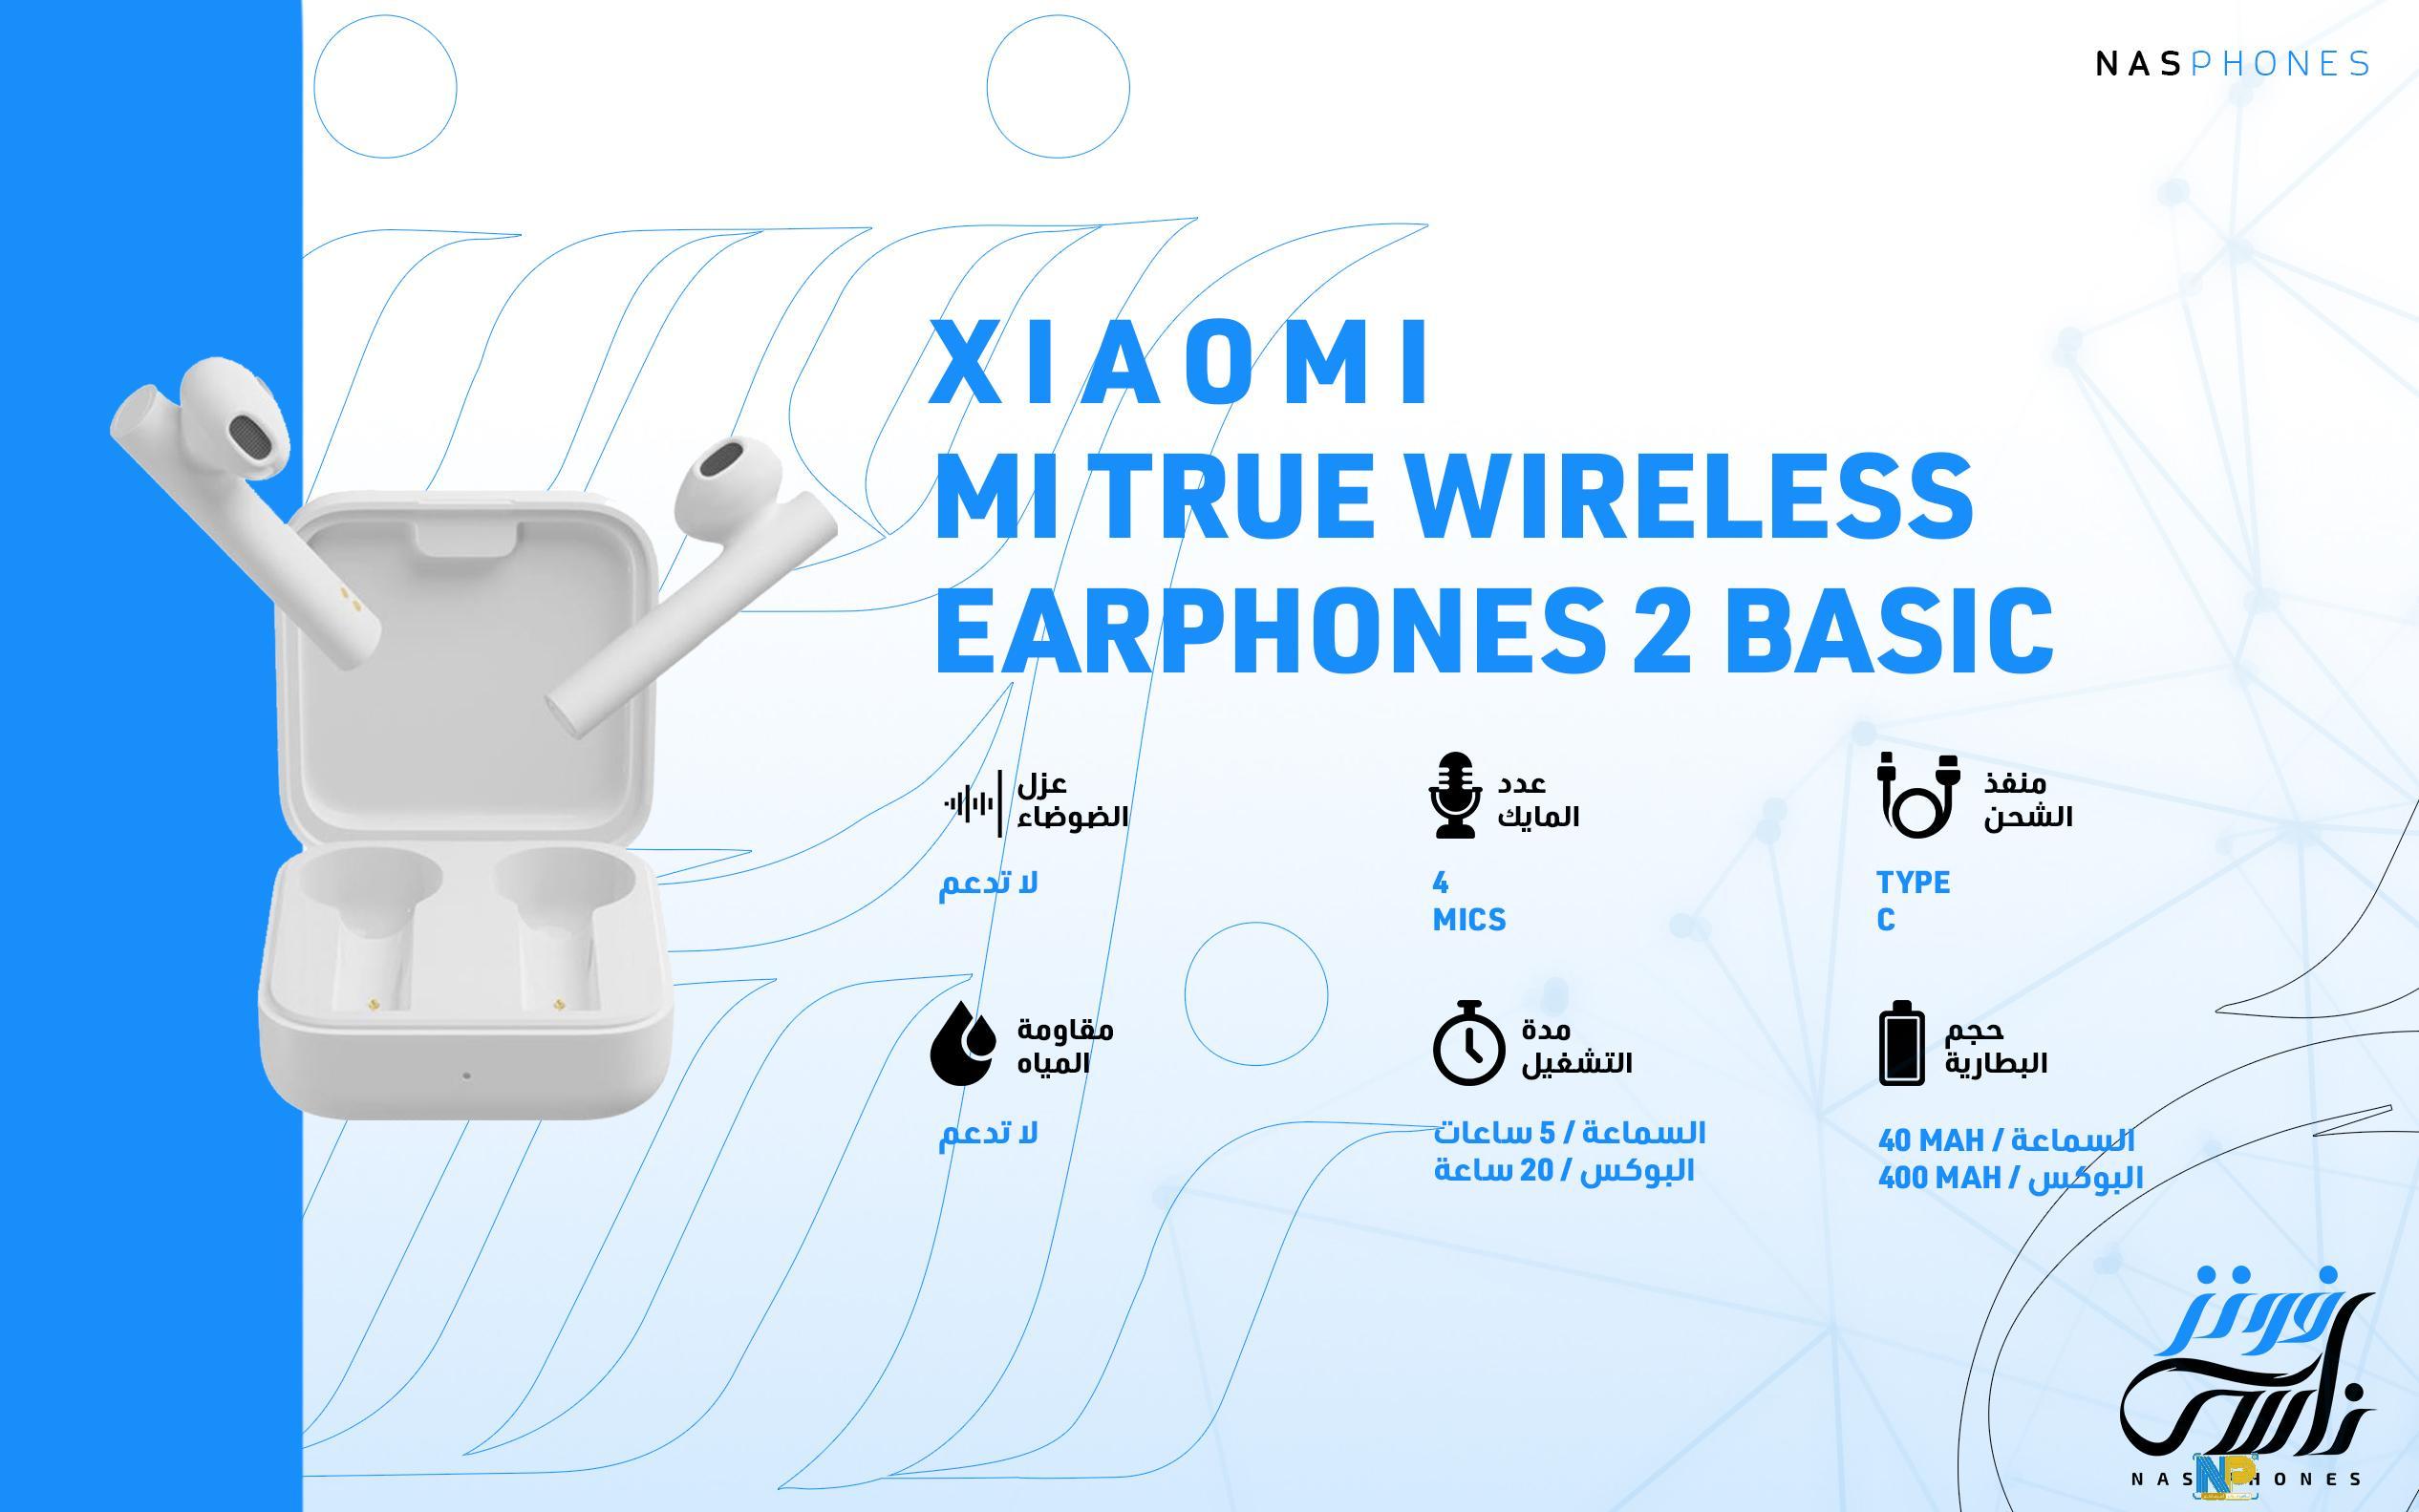 سماعة Mi True Wireless Earphones 2 Basic